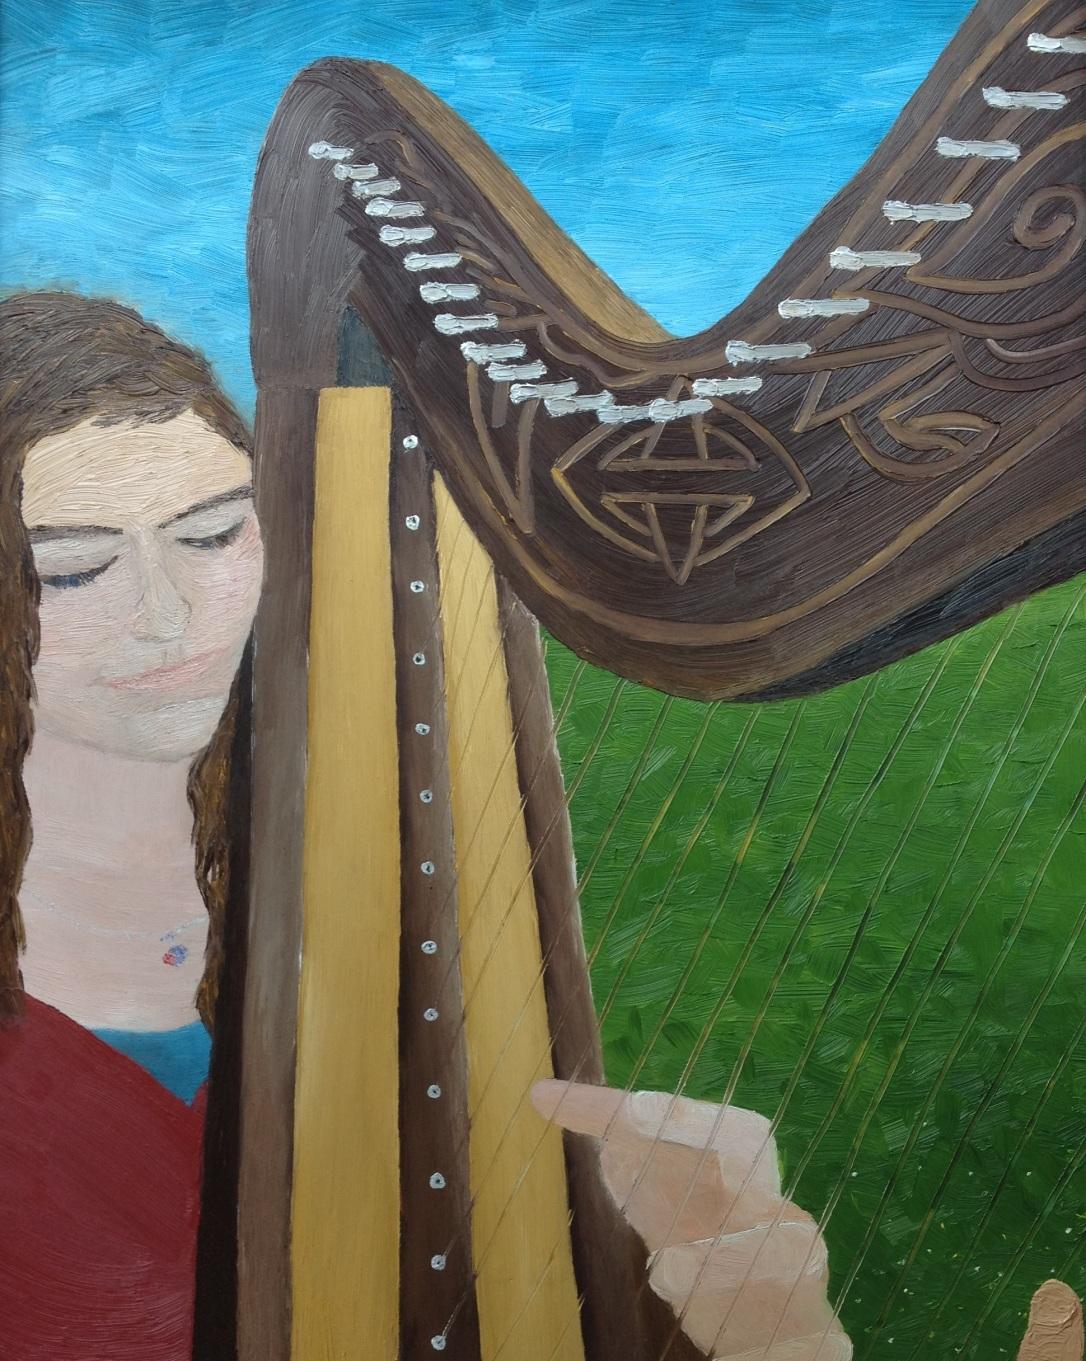 03 £70 Harp Player, oil on wooden board framed